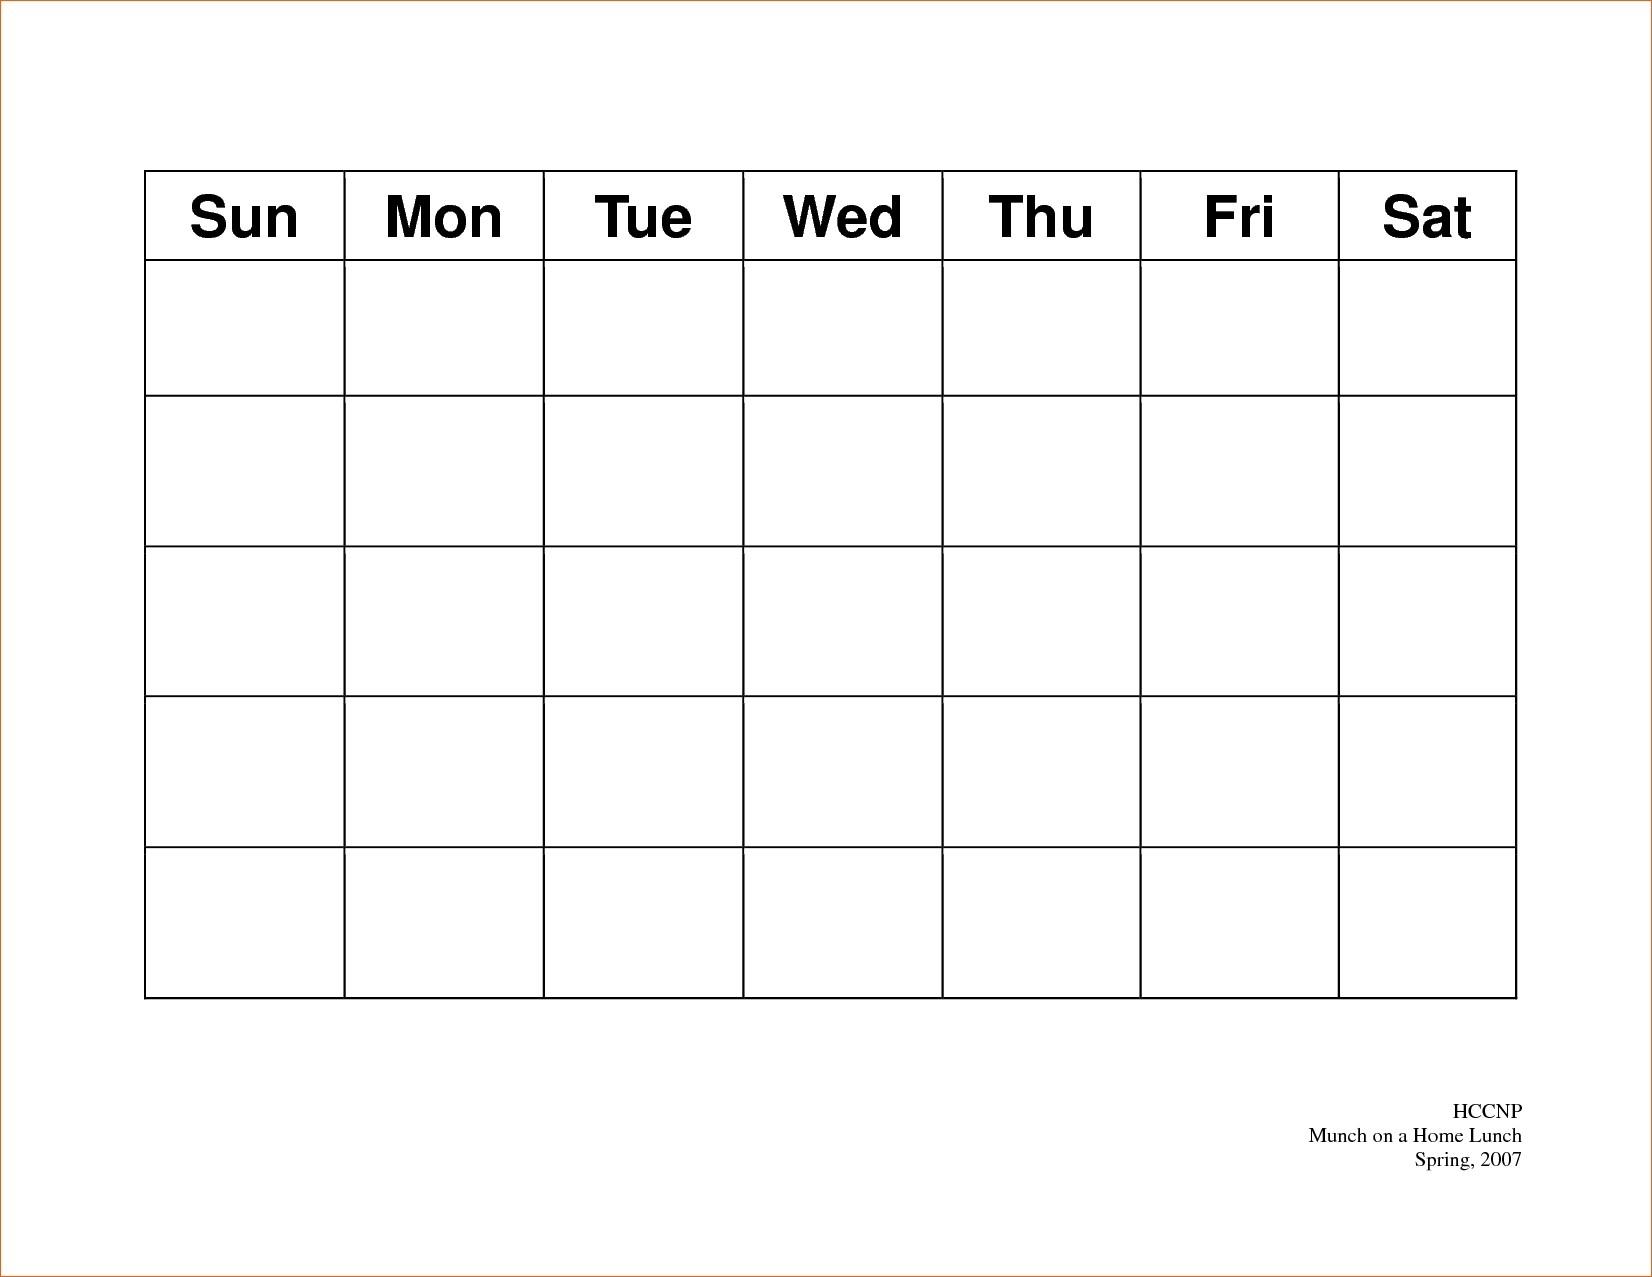 Calendar 5 Day Weekly Calendar Template On 5 Week Calendar Template within Free 5 Day Calendar Template